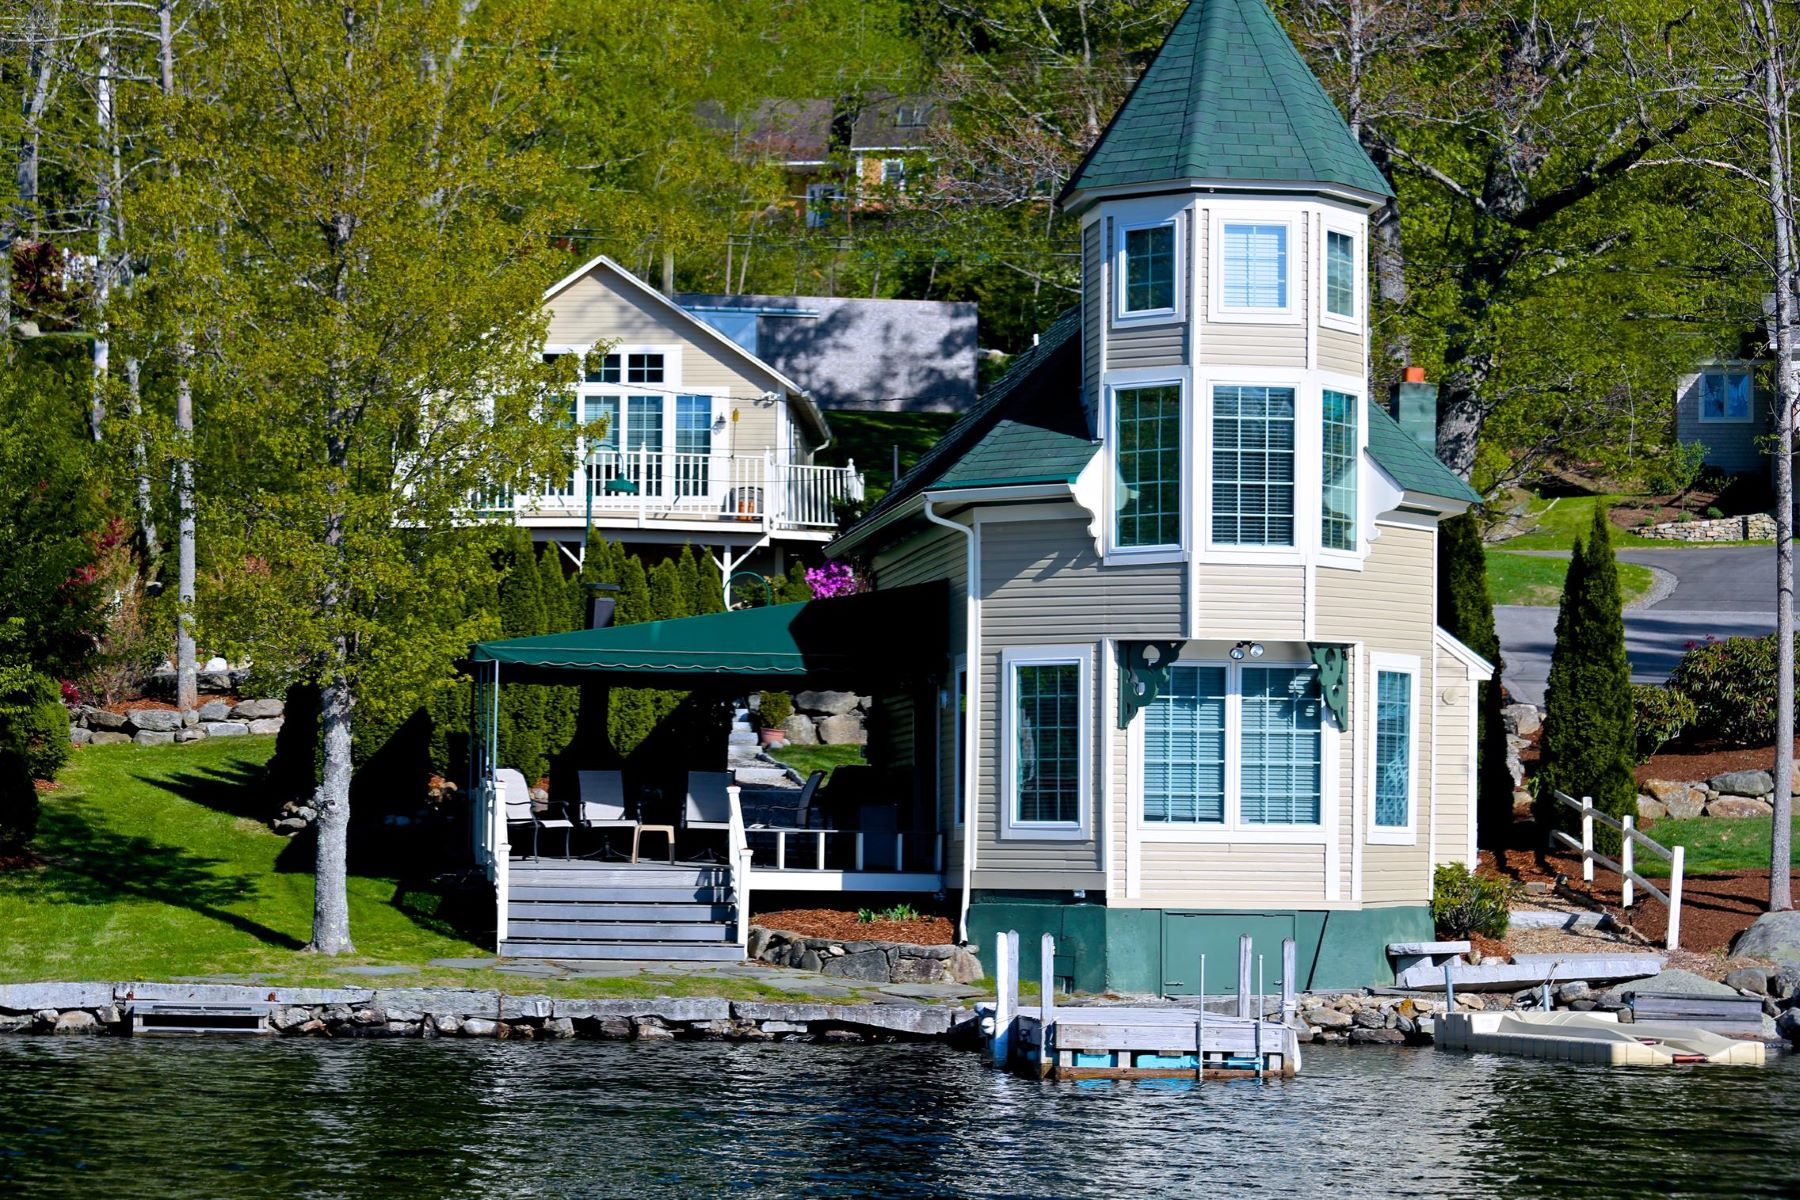 Single Family Home for Sale at Lake Sunapee Compound 45-47 Lake Ave Sunapee, New Hampshire 03782 United States